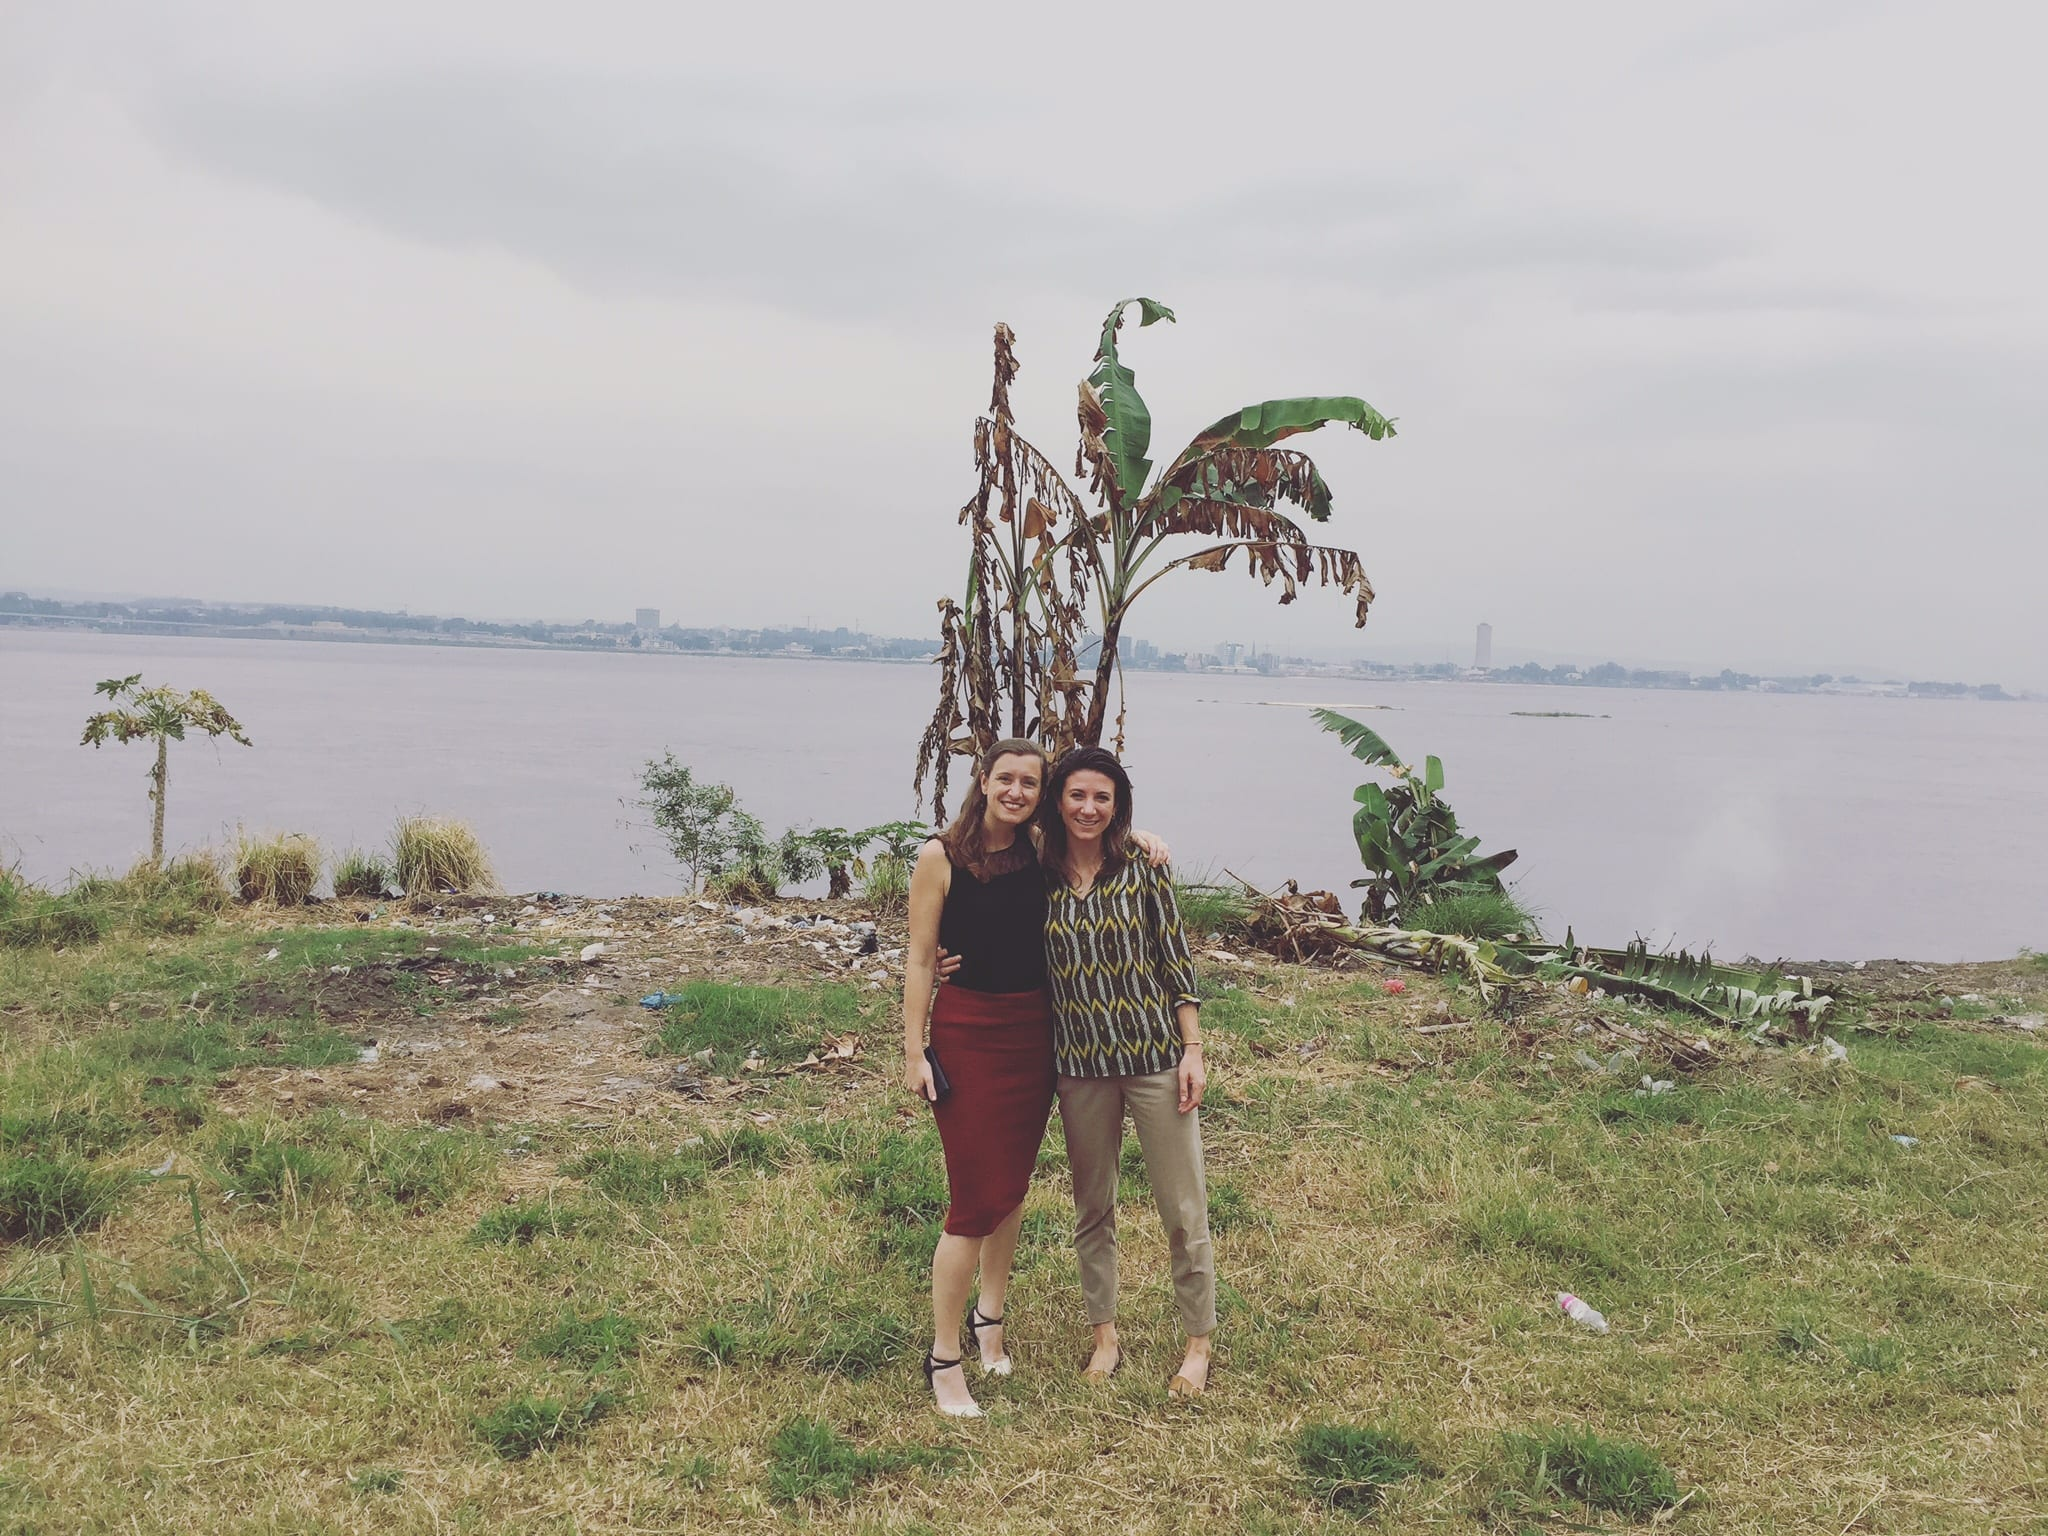 Liz Corbishley and Simone in Kinshasa, Democratic Republic of Congo